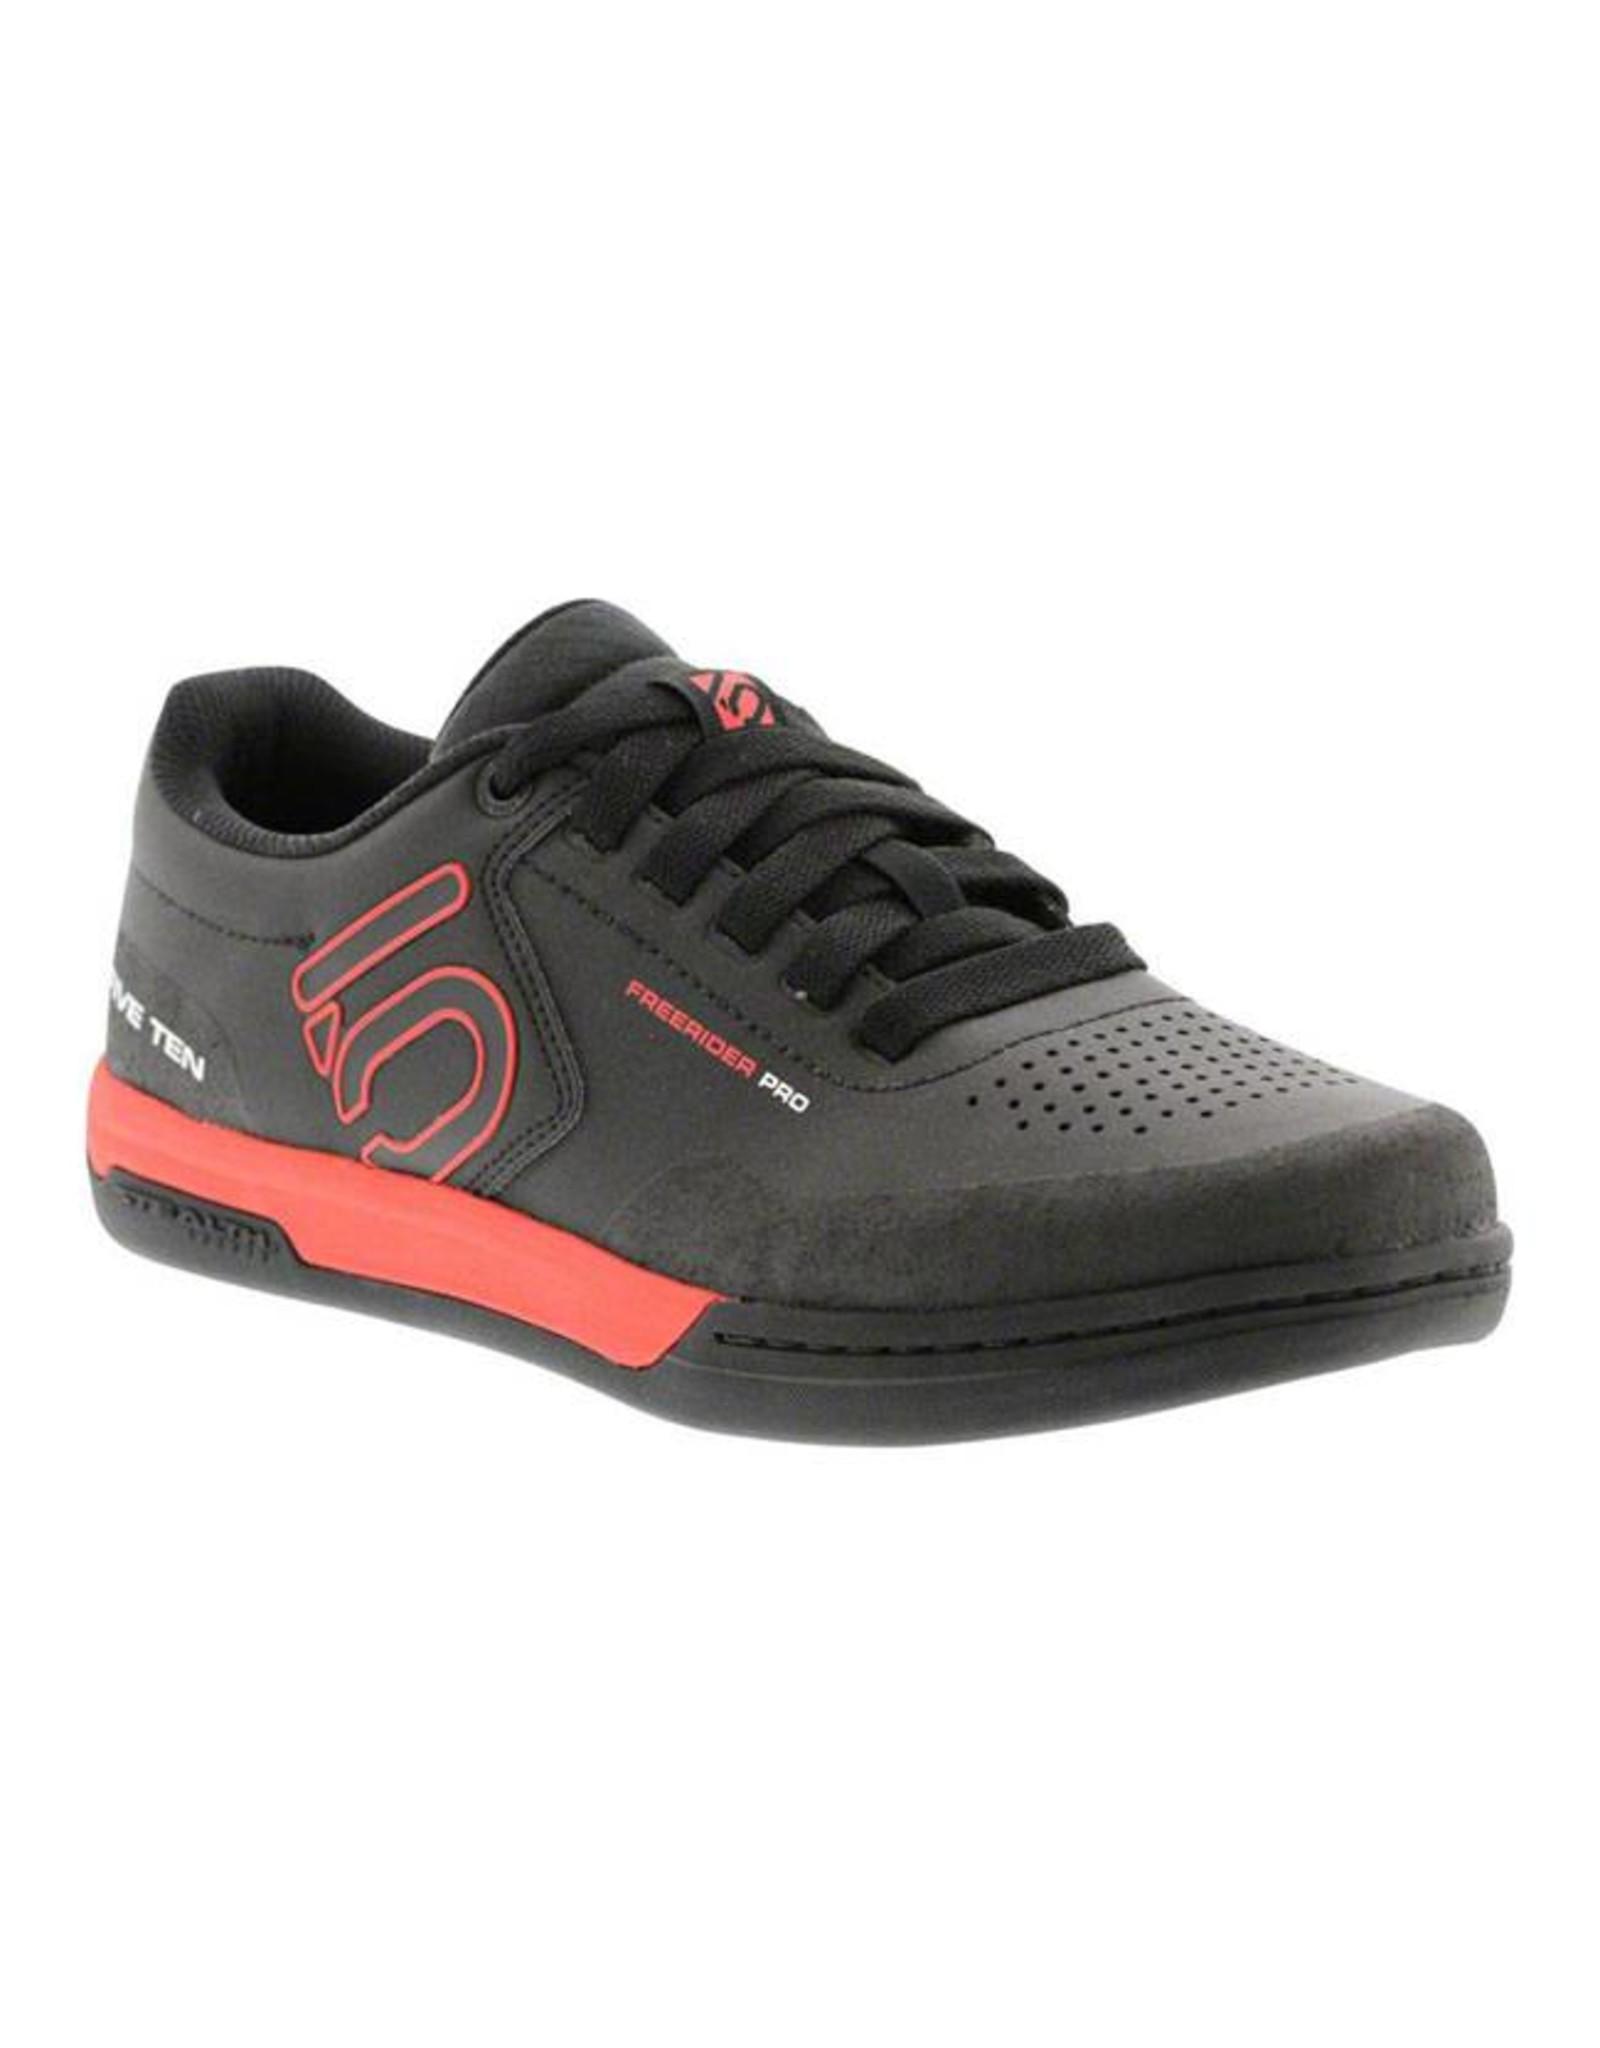 Five Ten Five Ten Freerider Pro Men's Flat Pedal Shoe: Black 11